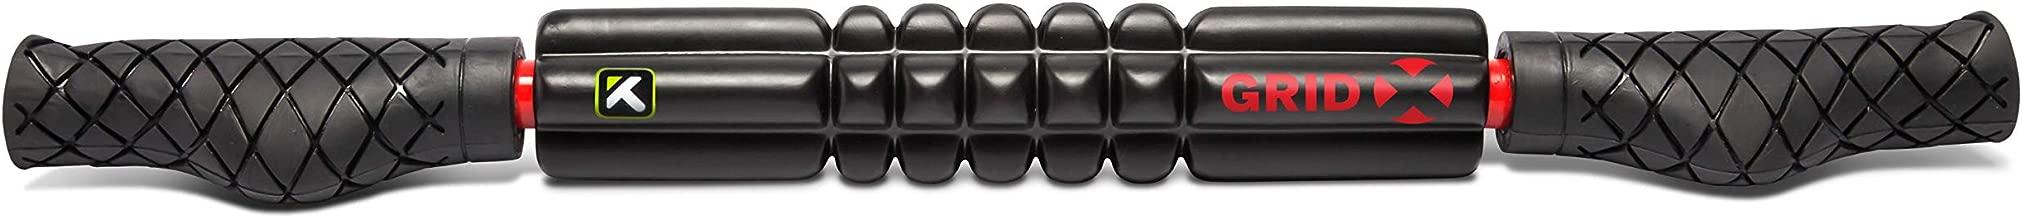 TriggerPoint Grid STK Handheld Foam Roller